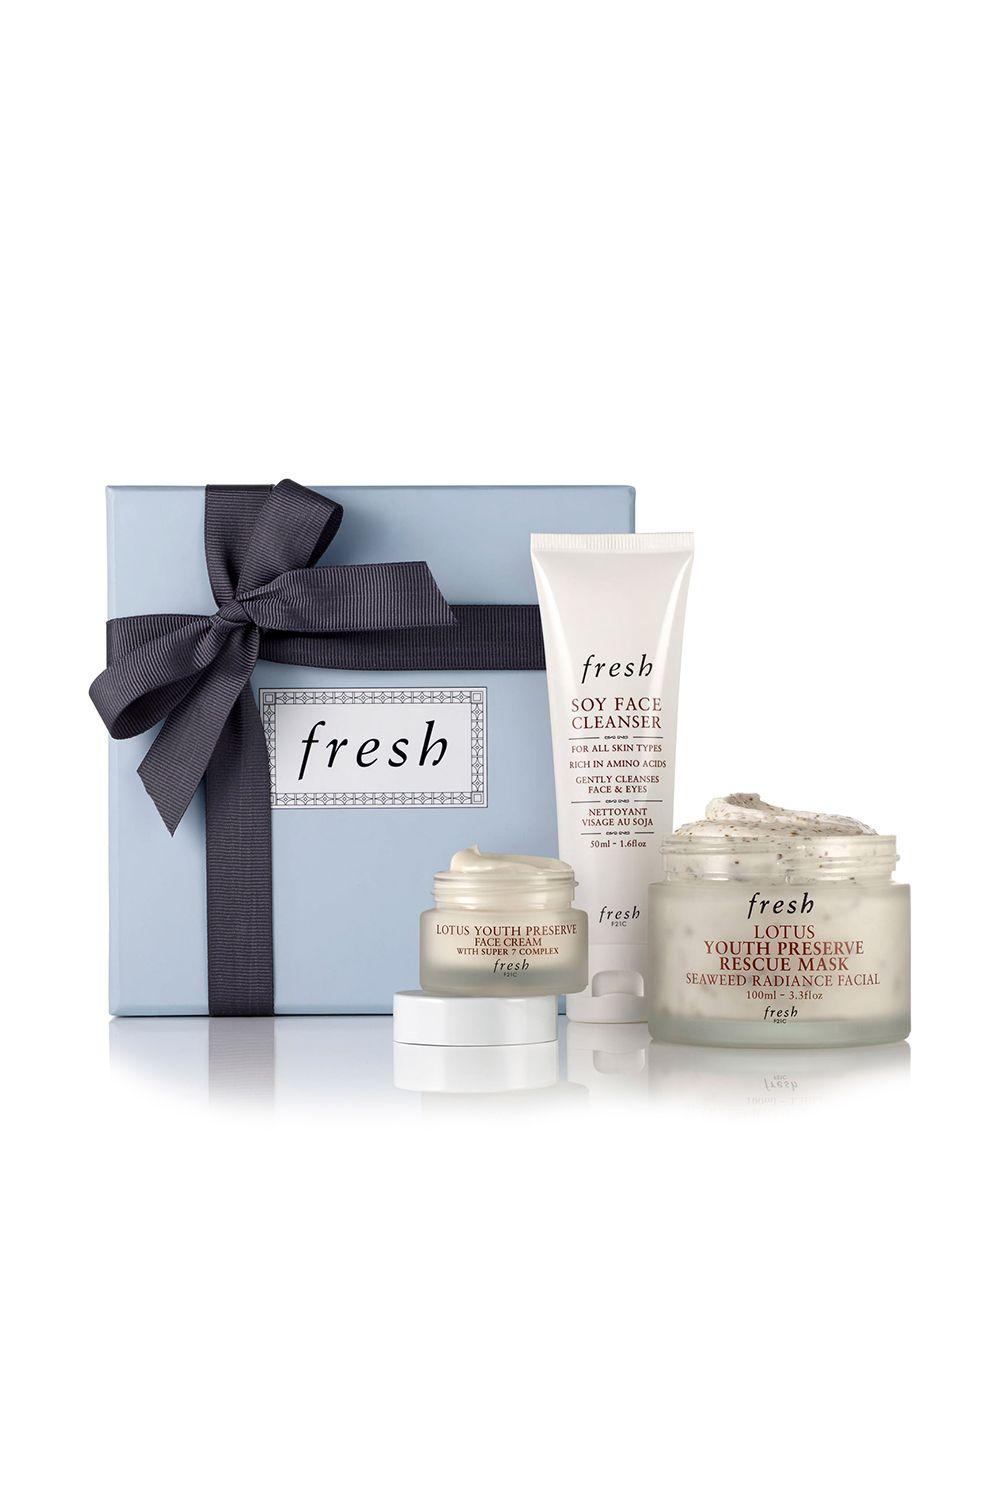 This Radiance-Boosting Skincare Set Fresh Radiance-Boosting Skin Care Set Cult-loved products that ensure a major glow ahead. Regular price: $73 Sale price: $58 SHOP IT